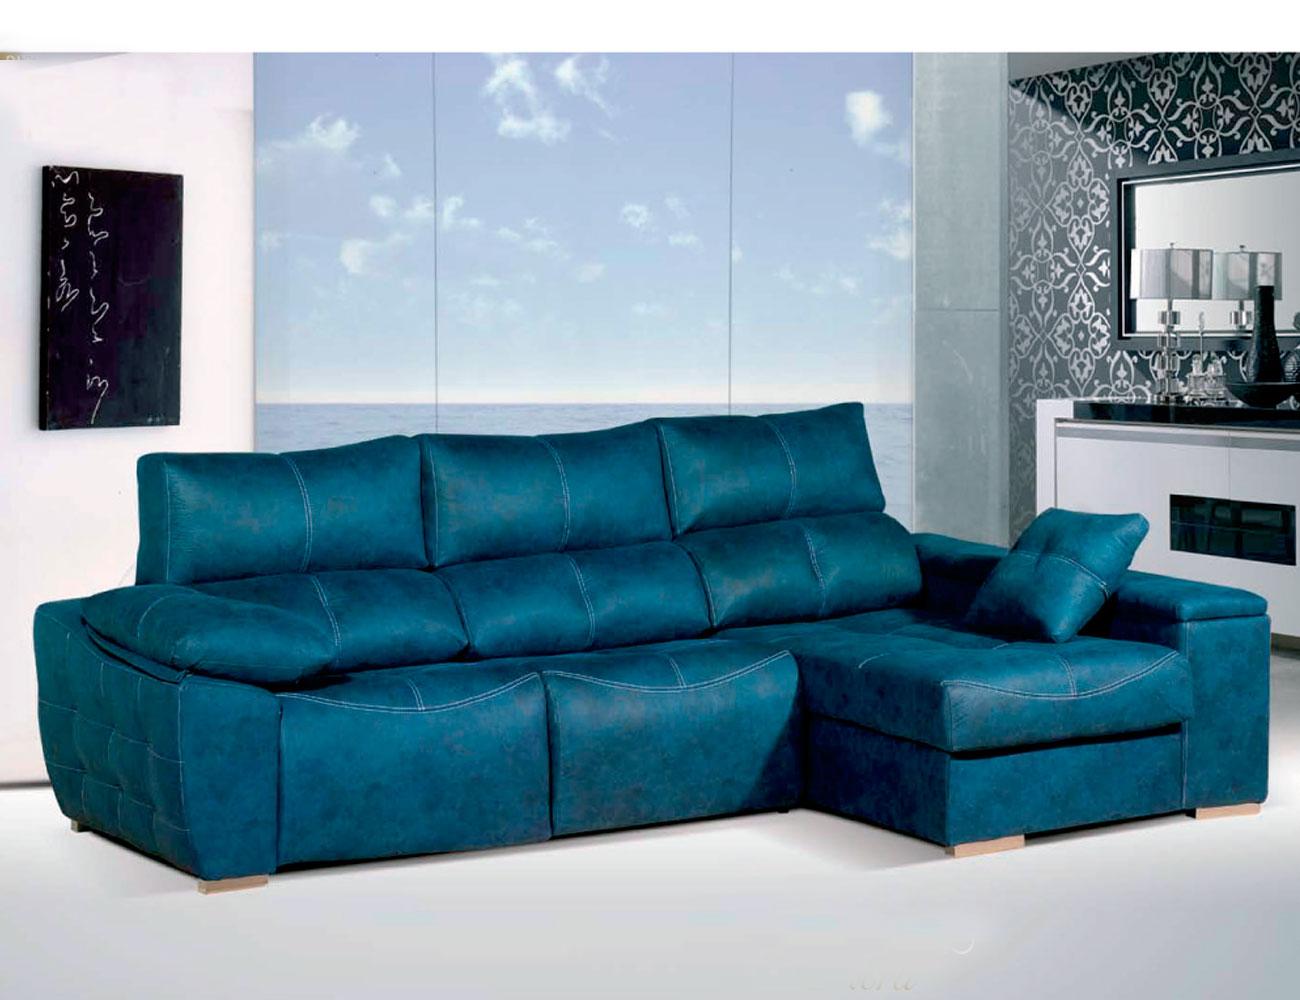 Sofa chaiselongue relax 2 motores anti manchas turquesa27